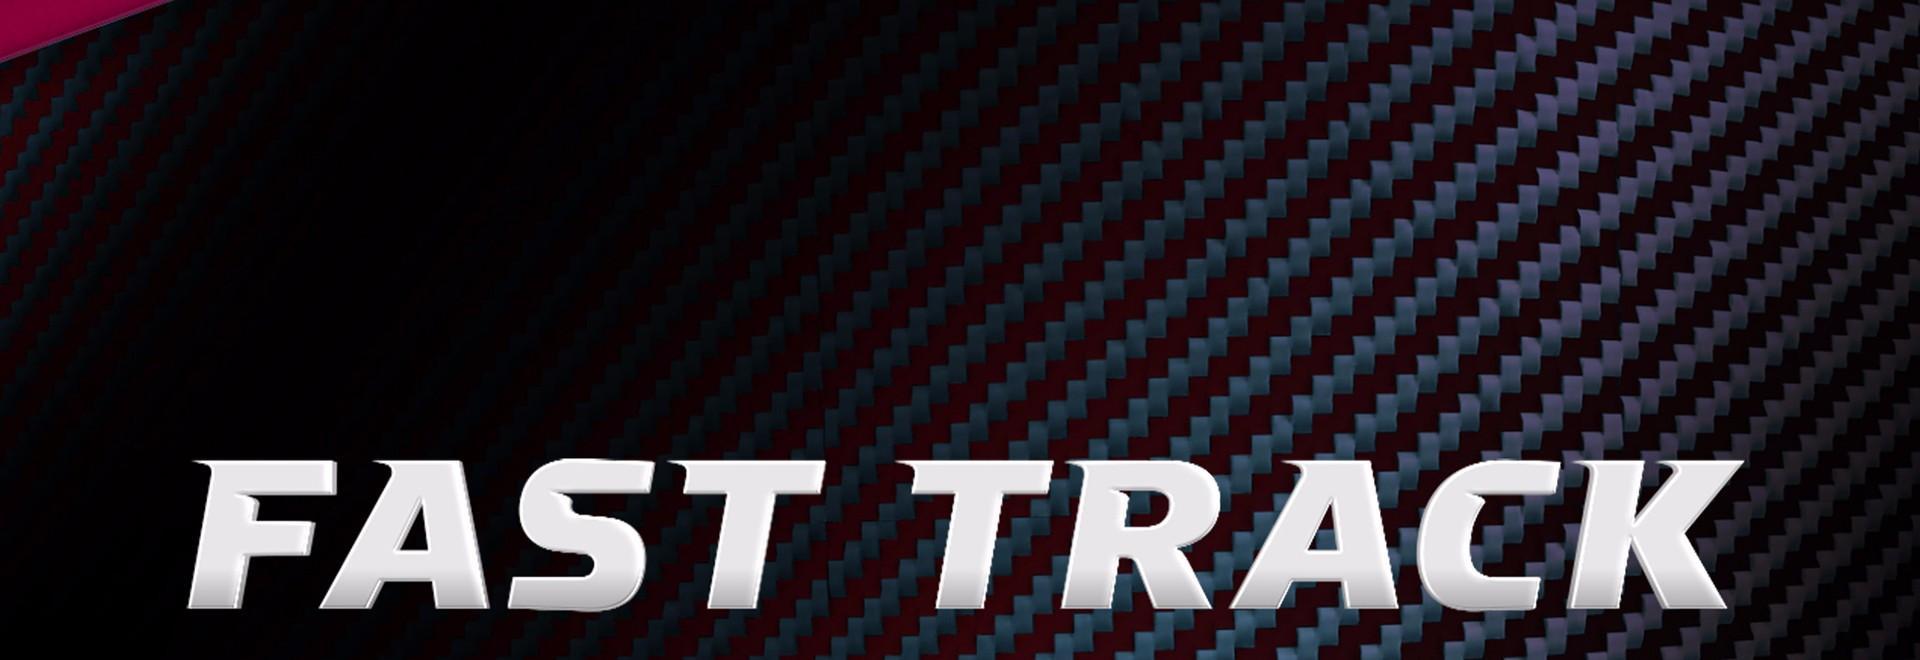 MotoGP Fast Track 2017